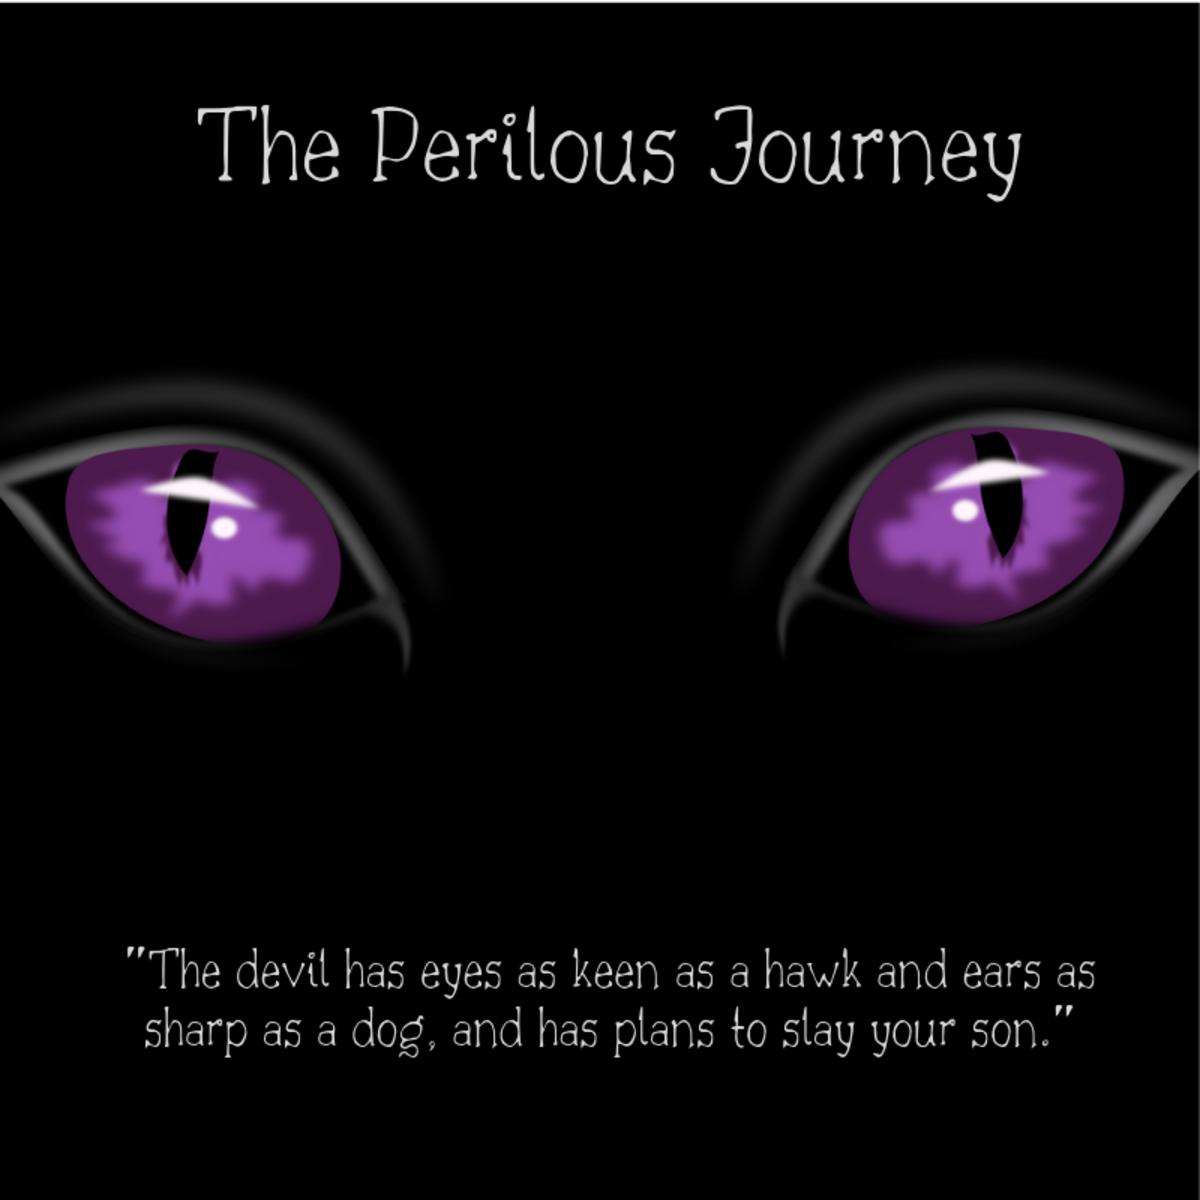 The Perilous Journey: A Short Story